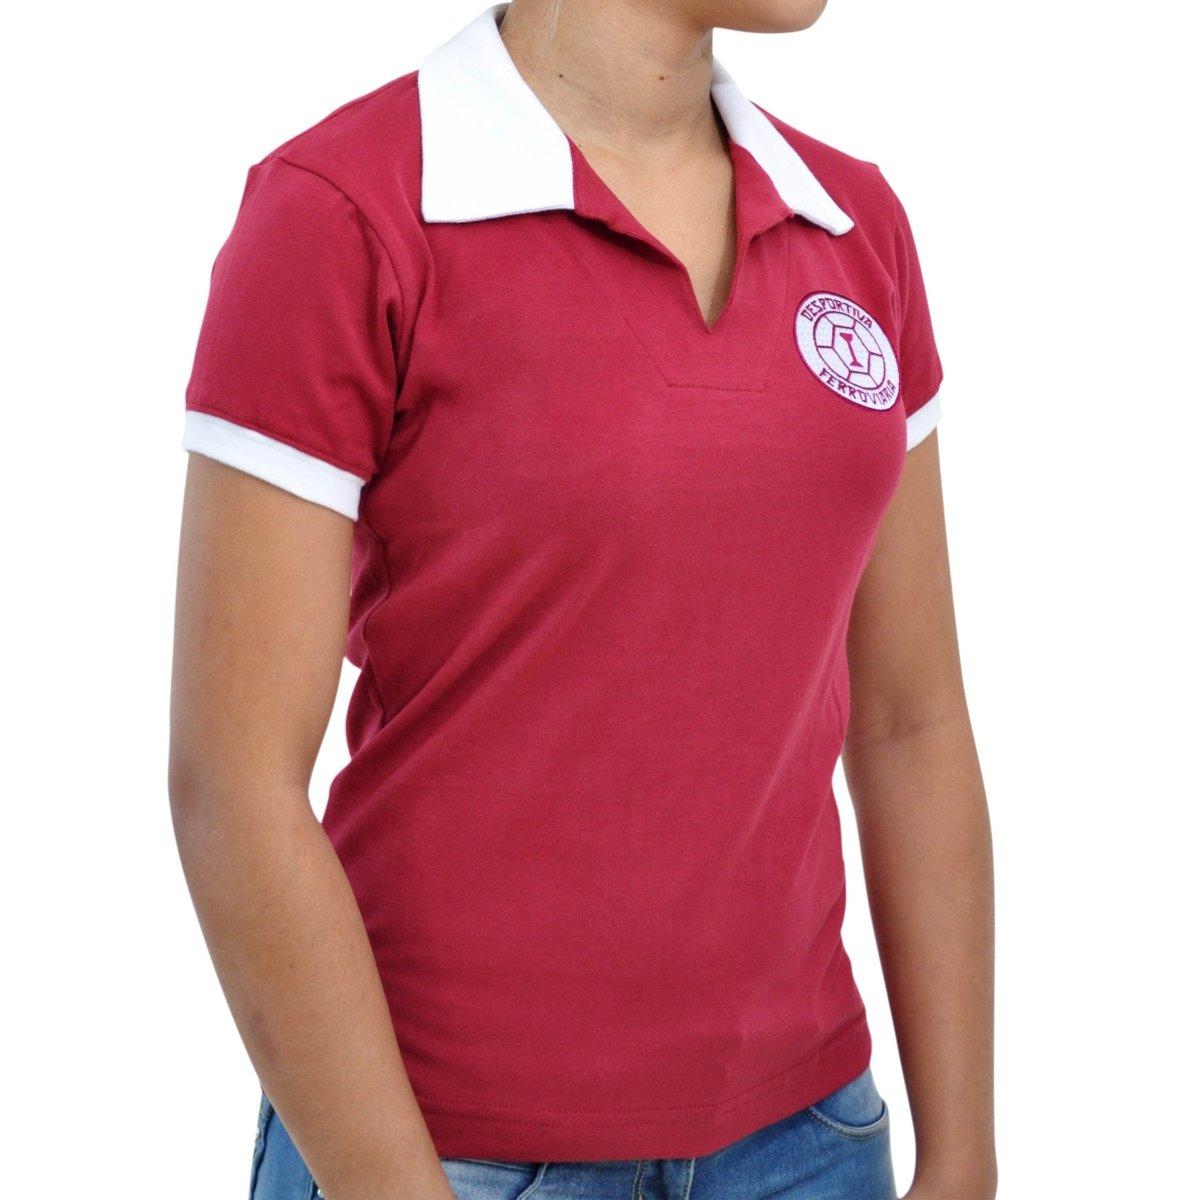 Mania Vinho Desportiva 1965 Camisa Retrô Feminina Feminina Mania Camisa Desportiva Ferroviária 1965 Ferroviária Retrô Vinho Camisa 6gxxvw